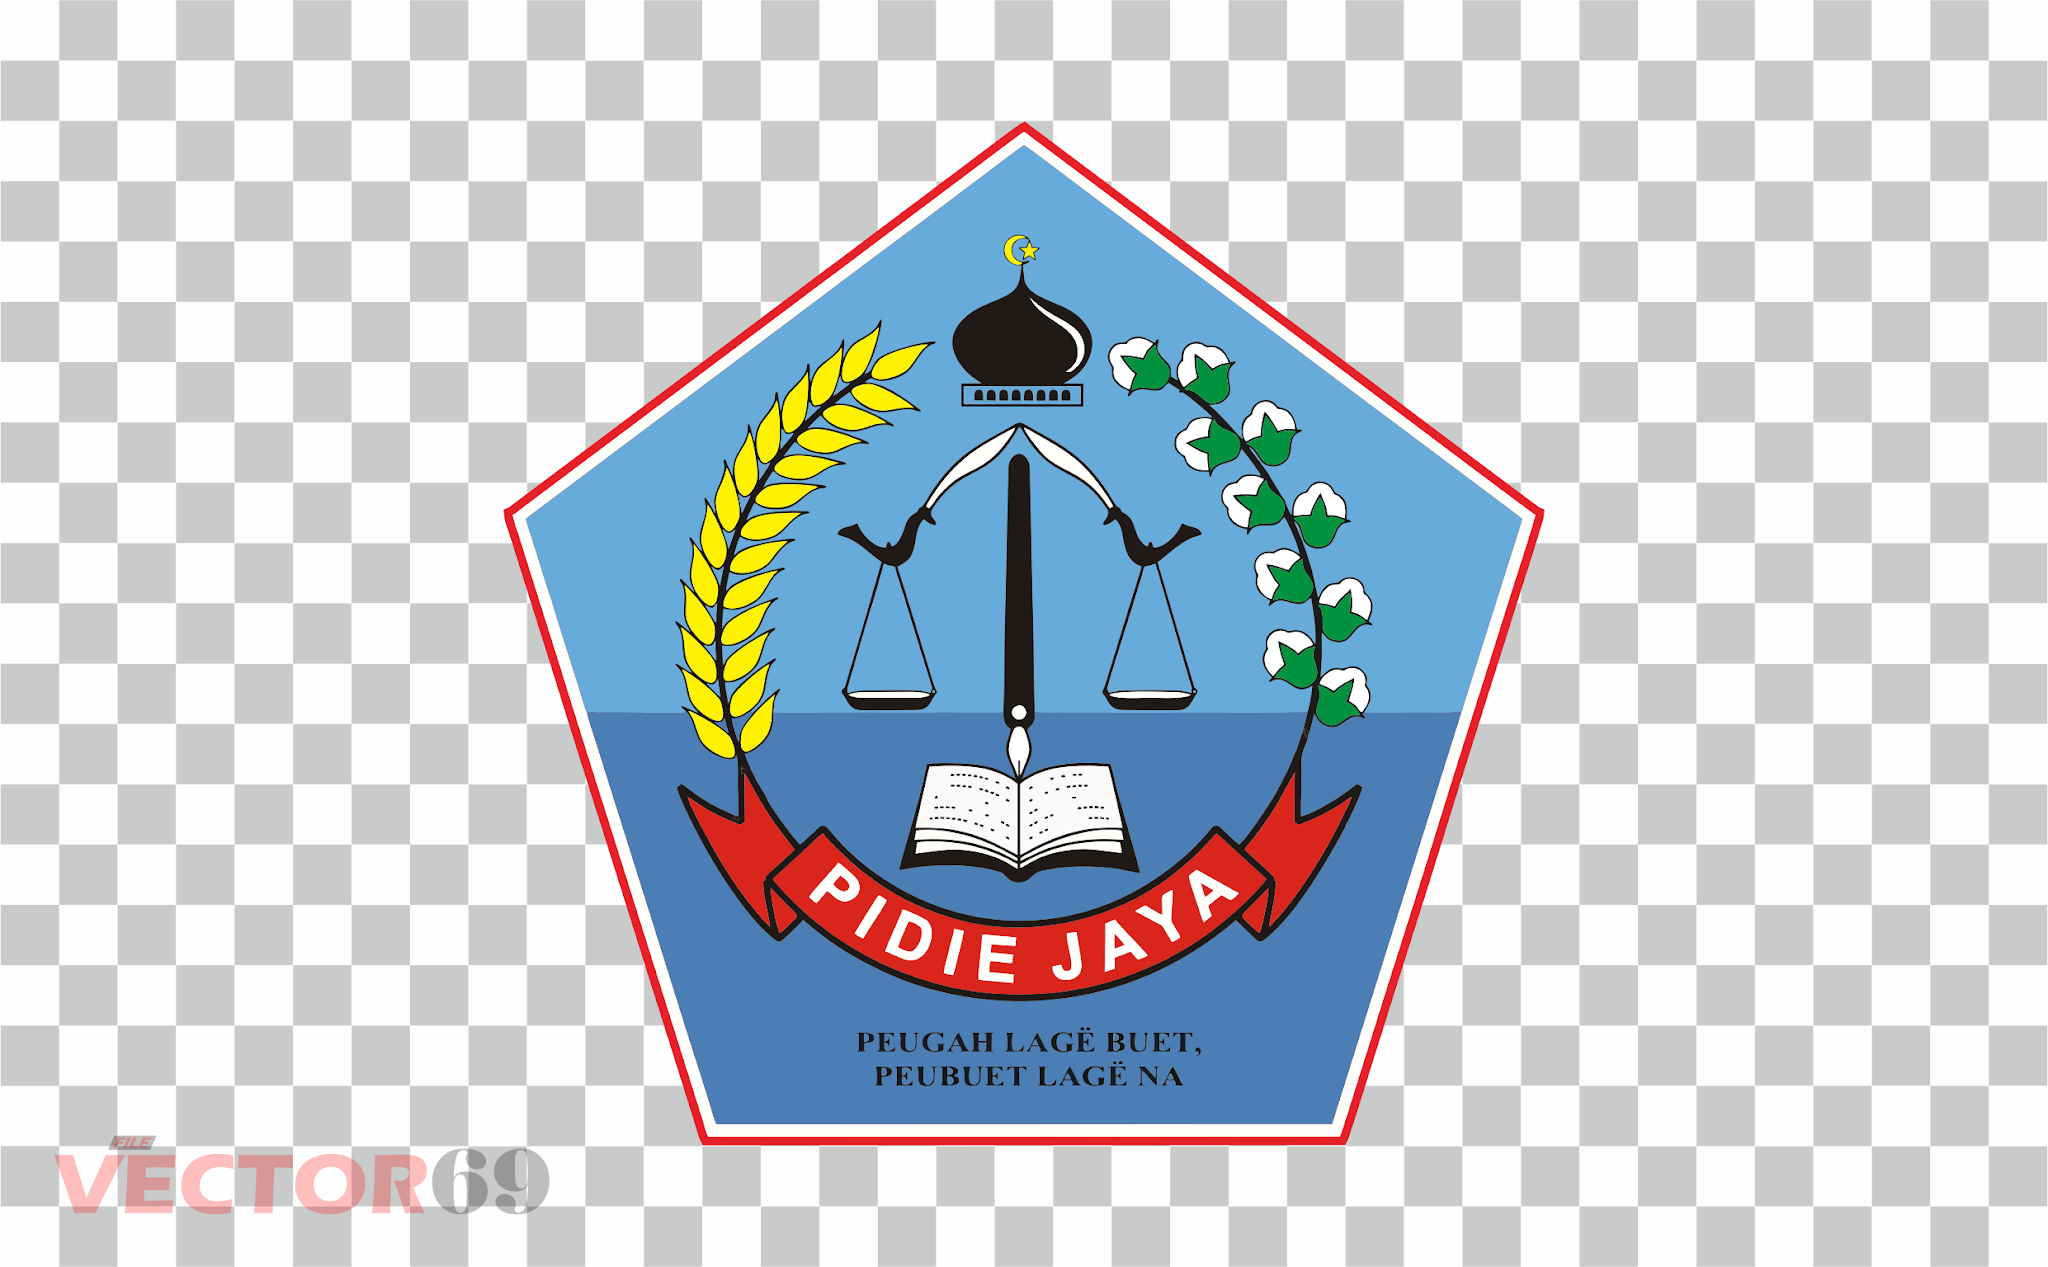 Kabupaten Pidie Jaya Logo - Download Vector File PNG (Portable Network Graphics)